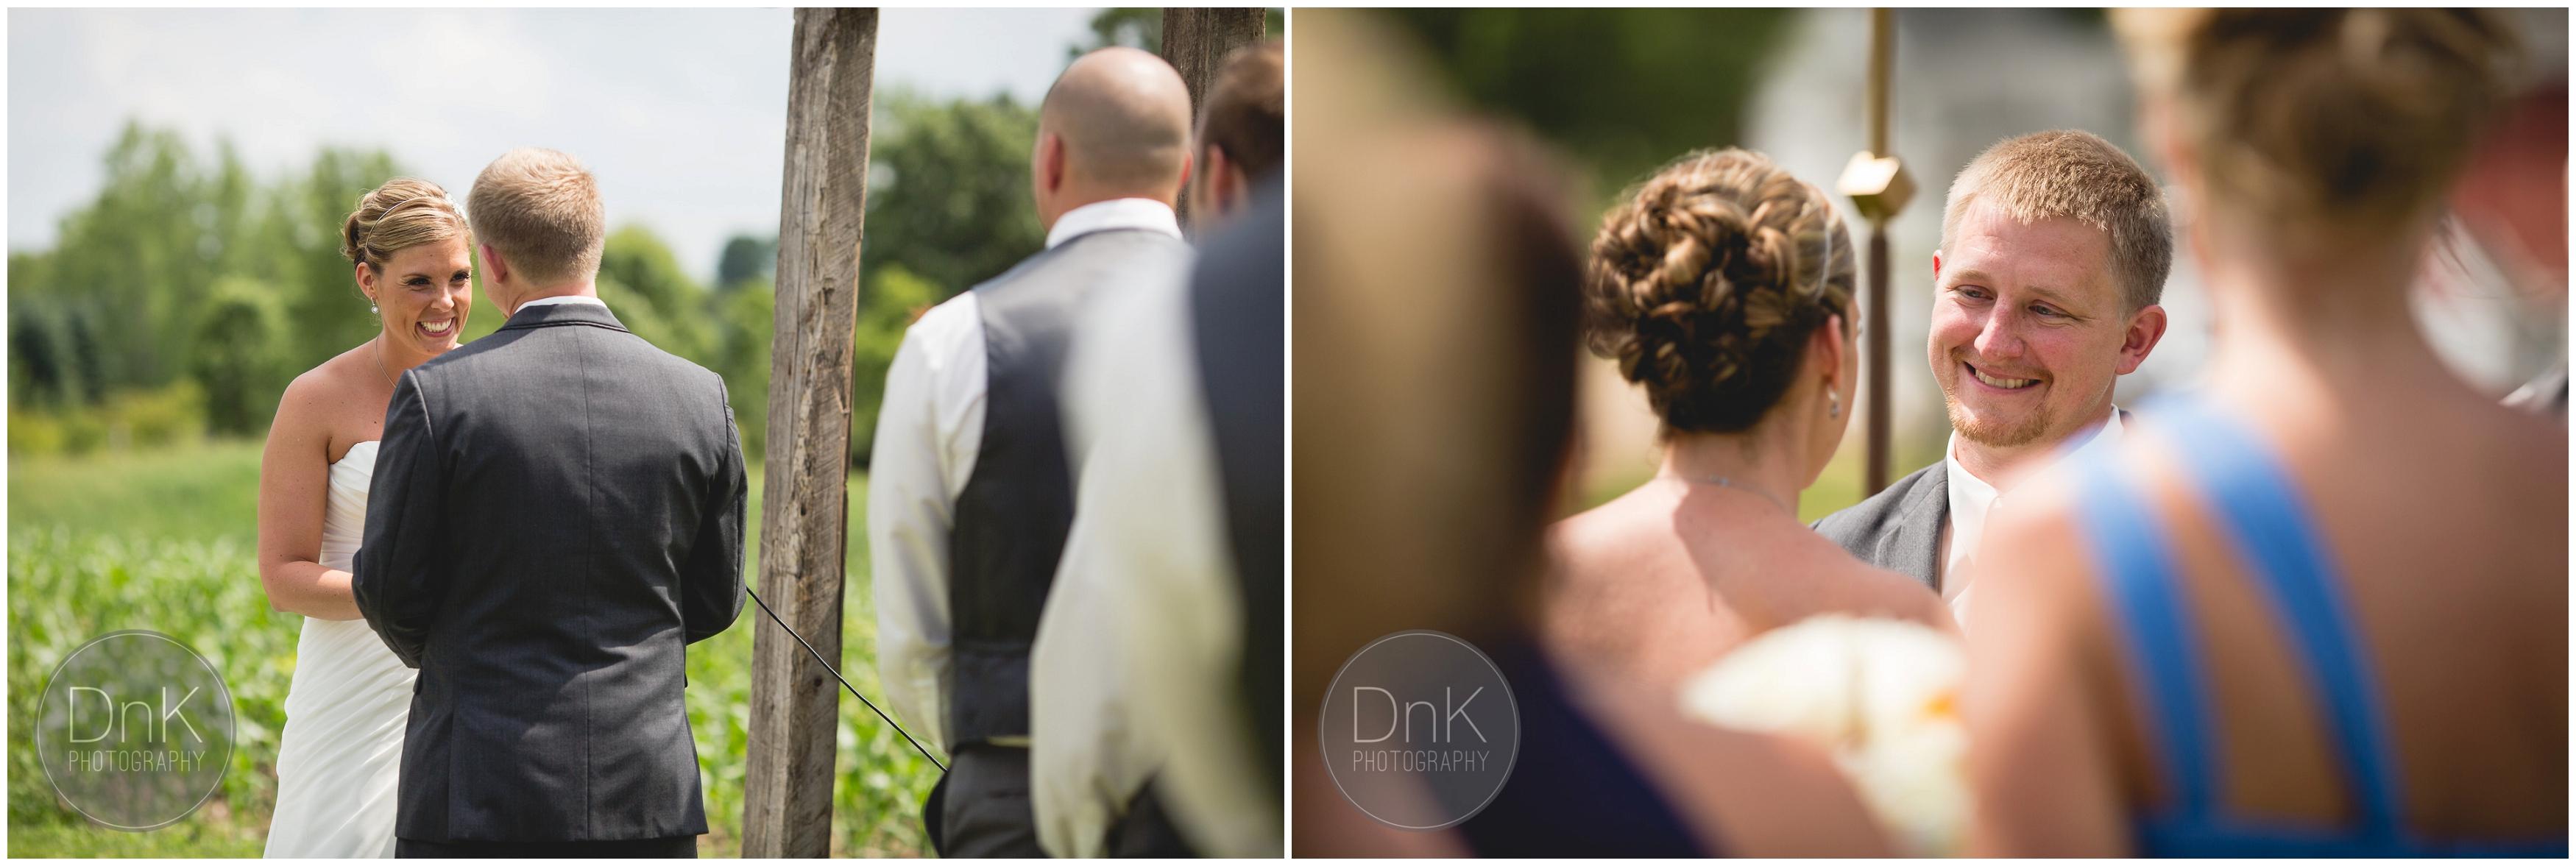 22- Outdoor Wedding Ceremony Dellwood Barn